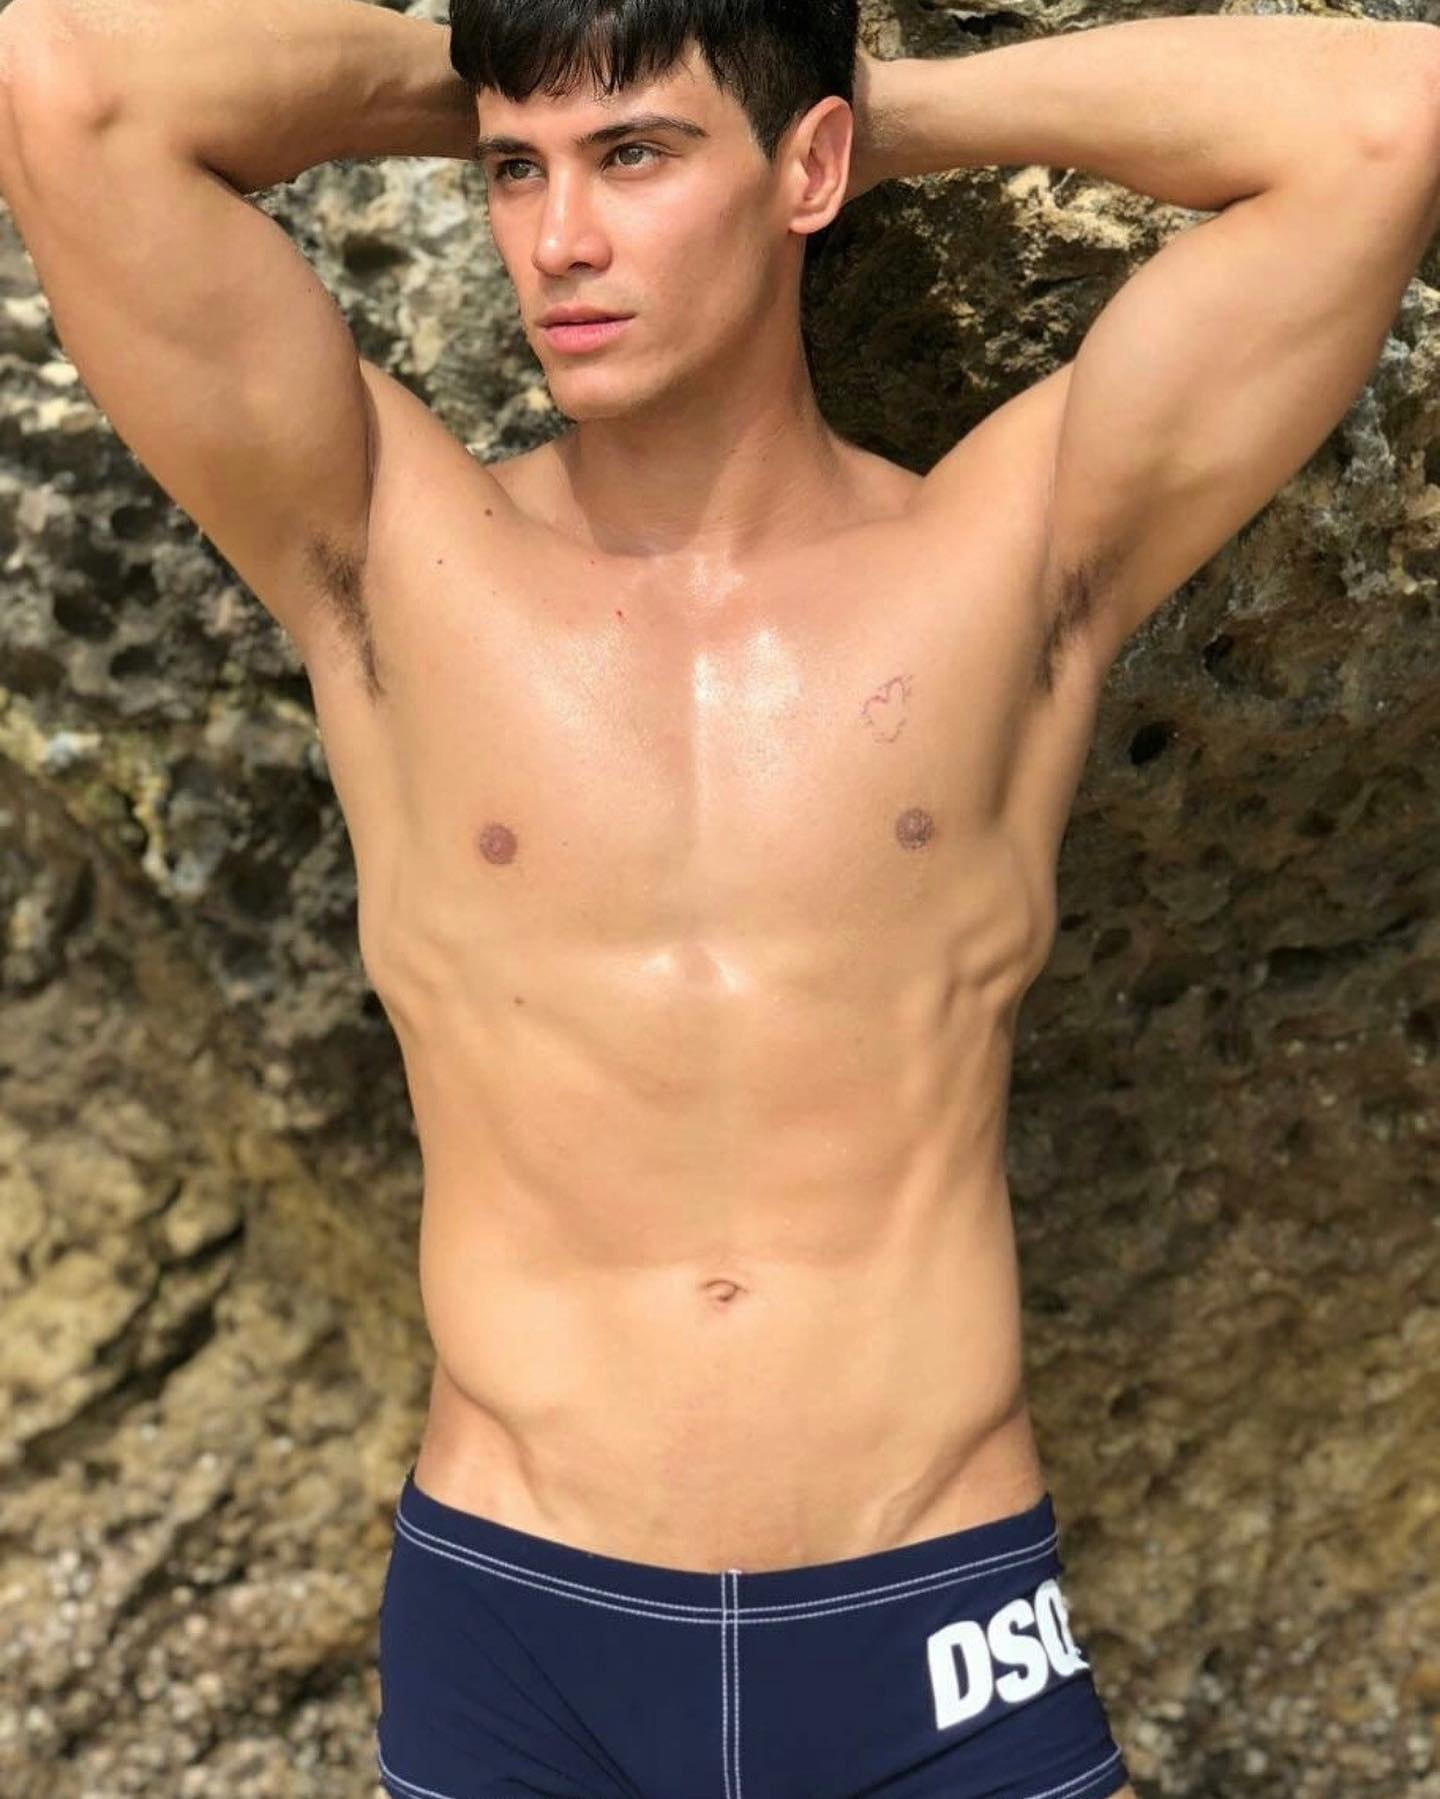 #men #twinks #swimsuit #hotboys #hotmen #sexy #armpits #abs